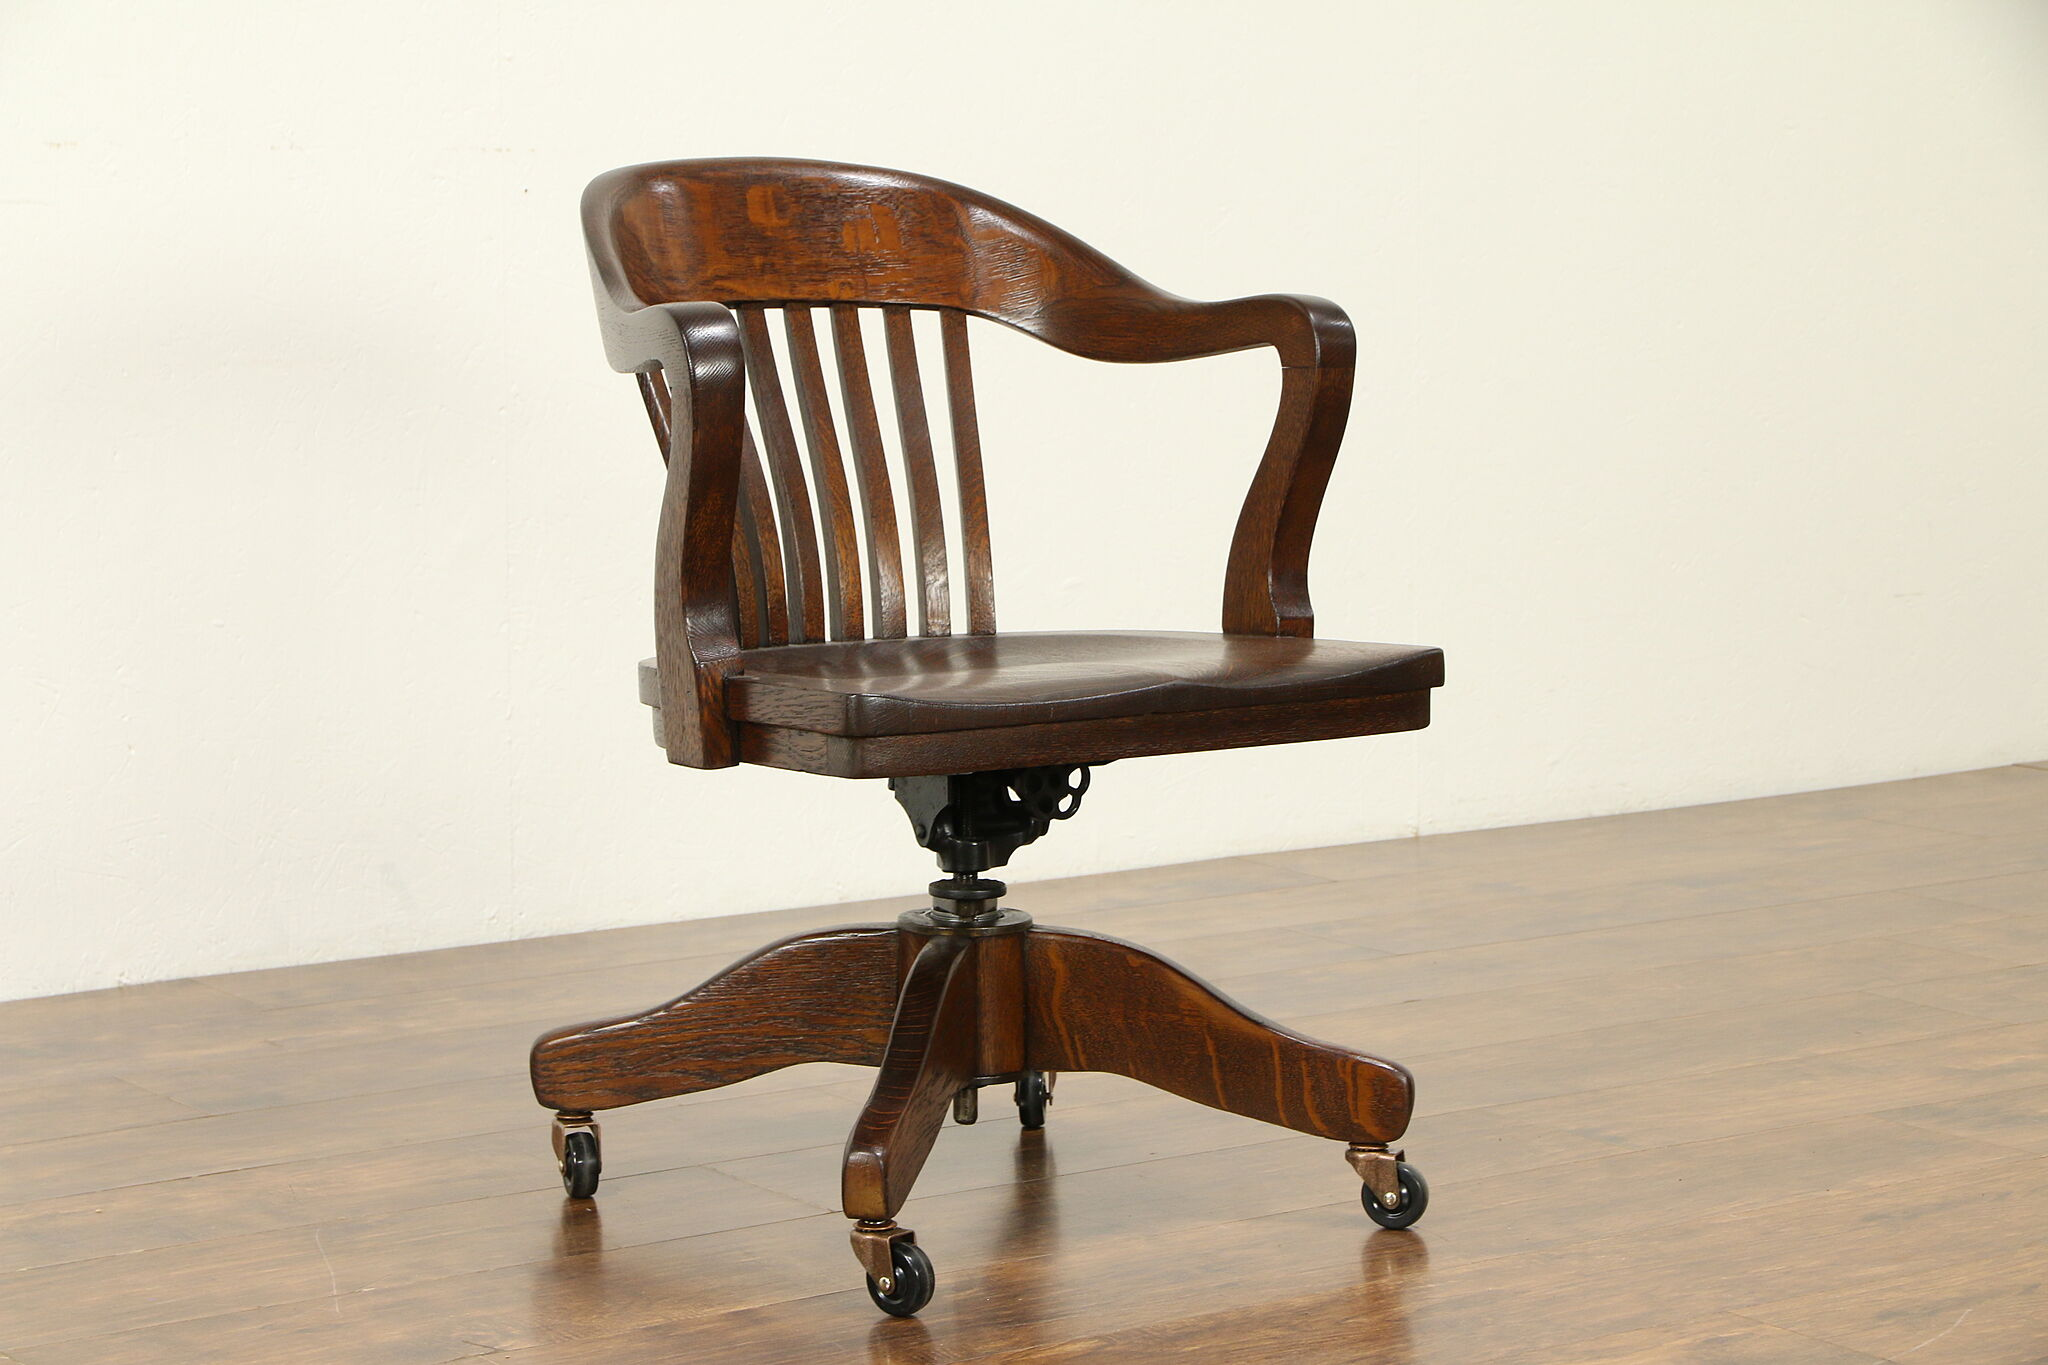 Fantastic Swivel Adjustable Quarter Sawn Oak Antique Office Desk Chair Taylor 31940 Uwap Interior Chair Design Uwaporg